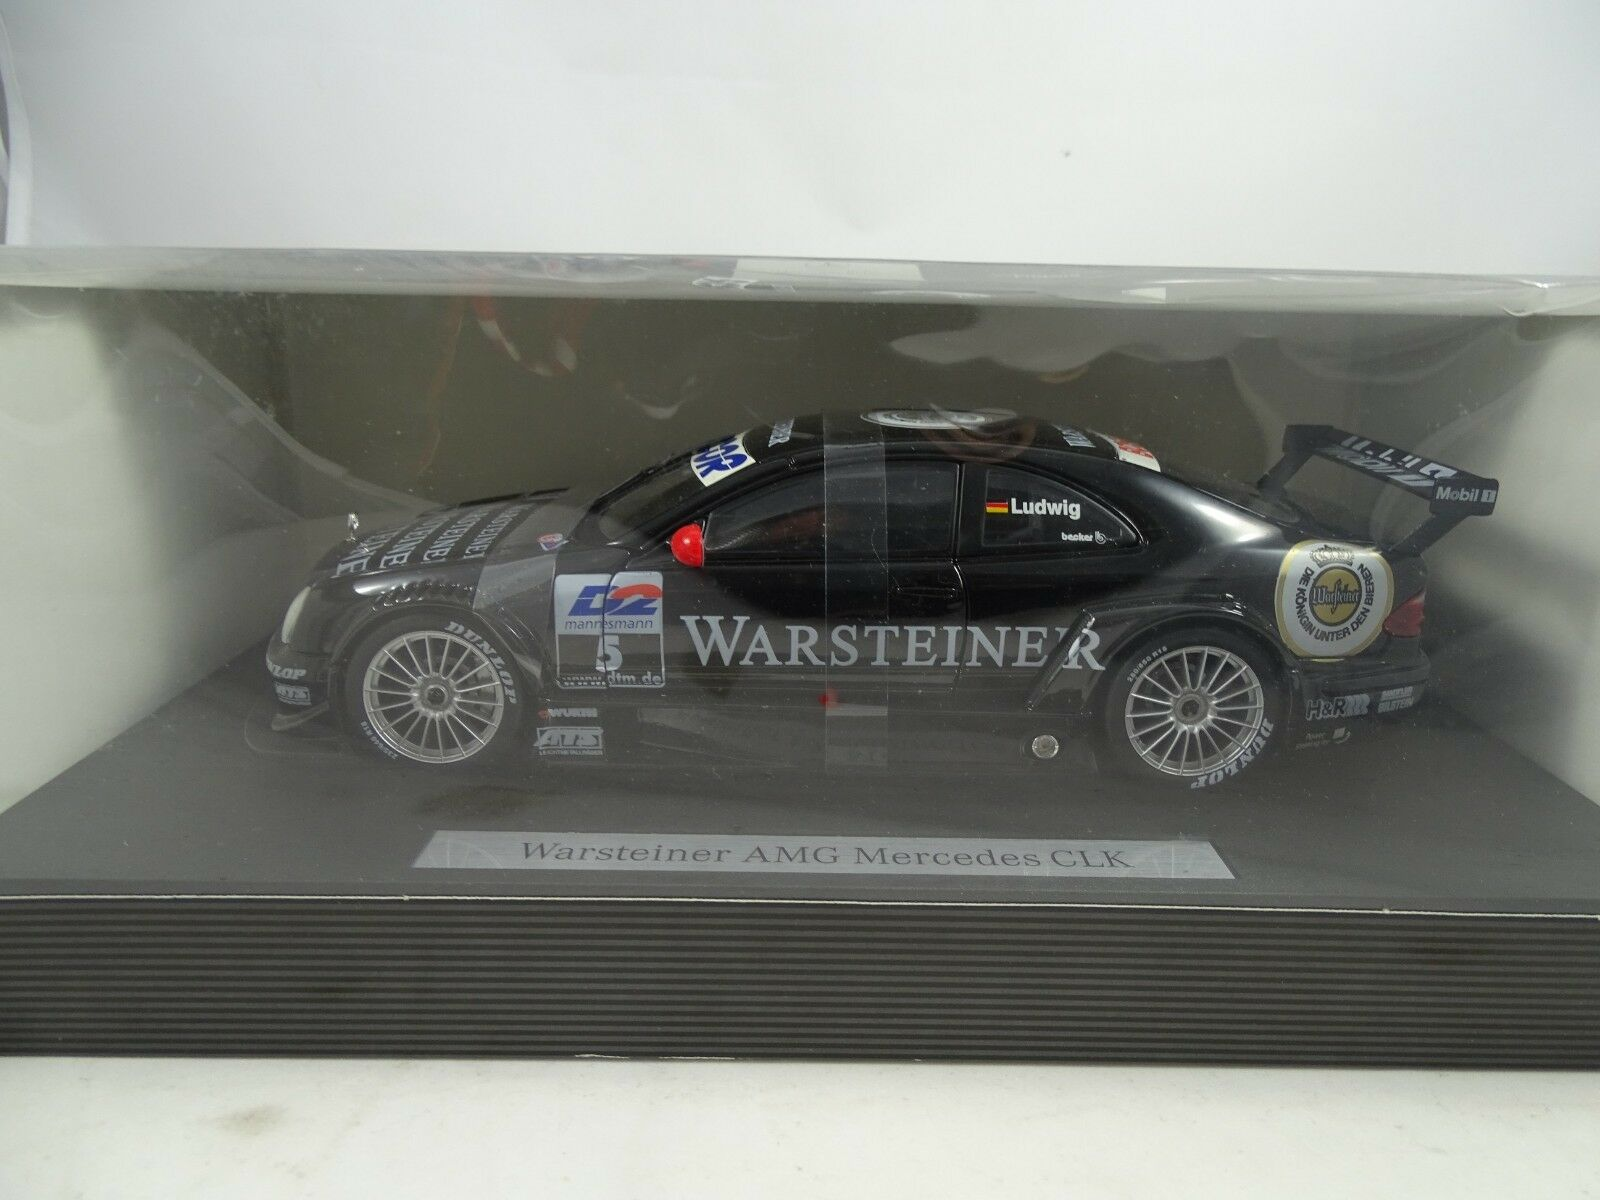 1 18  Museumsmodell  B66962109 Warsteiner AMG Mercedes CLK   5 Ludwig  RARITÄT§